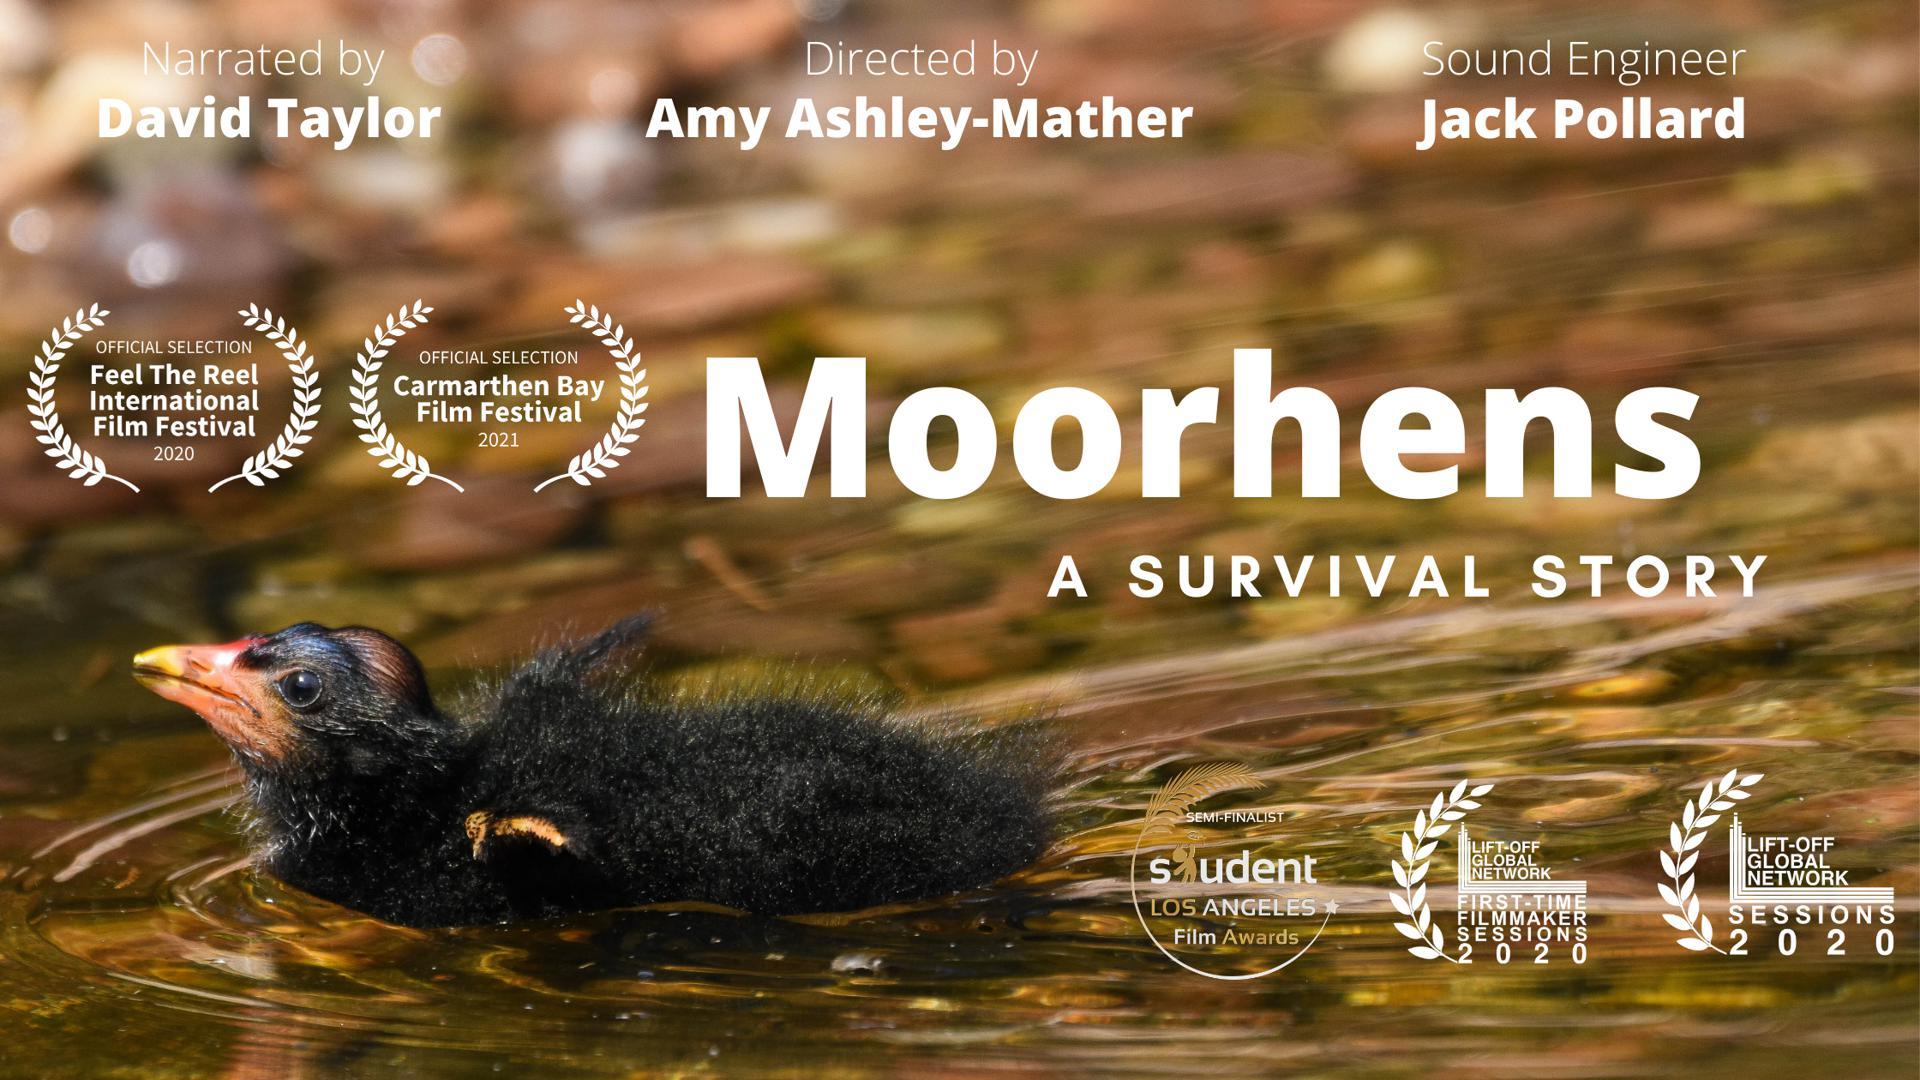 Moorhens: A Survival Story